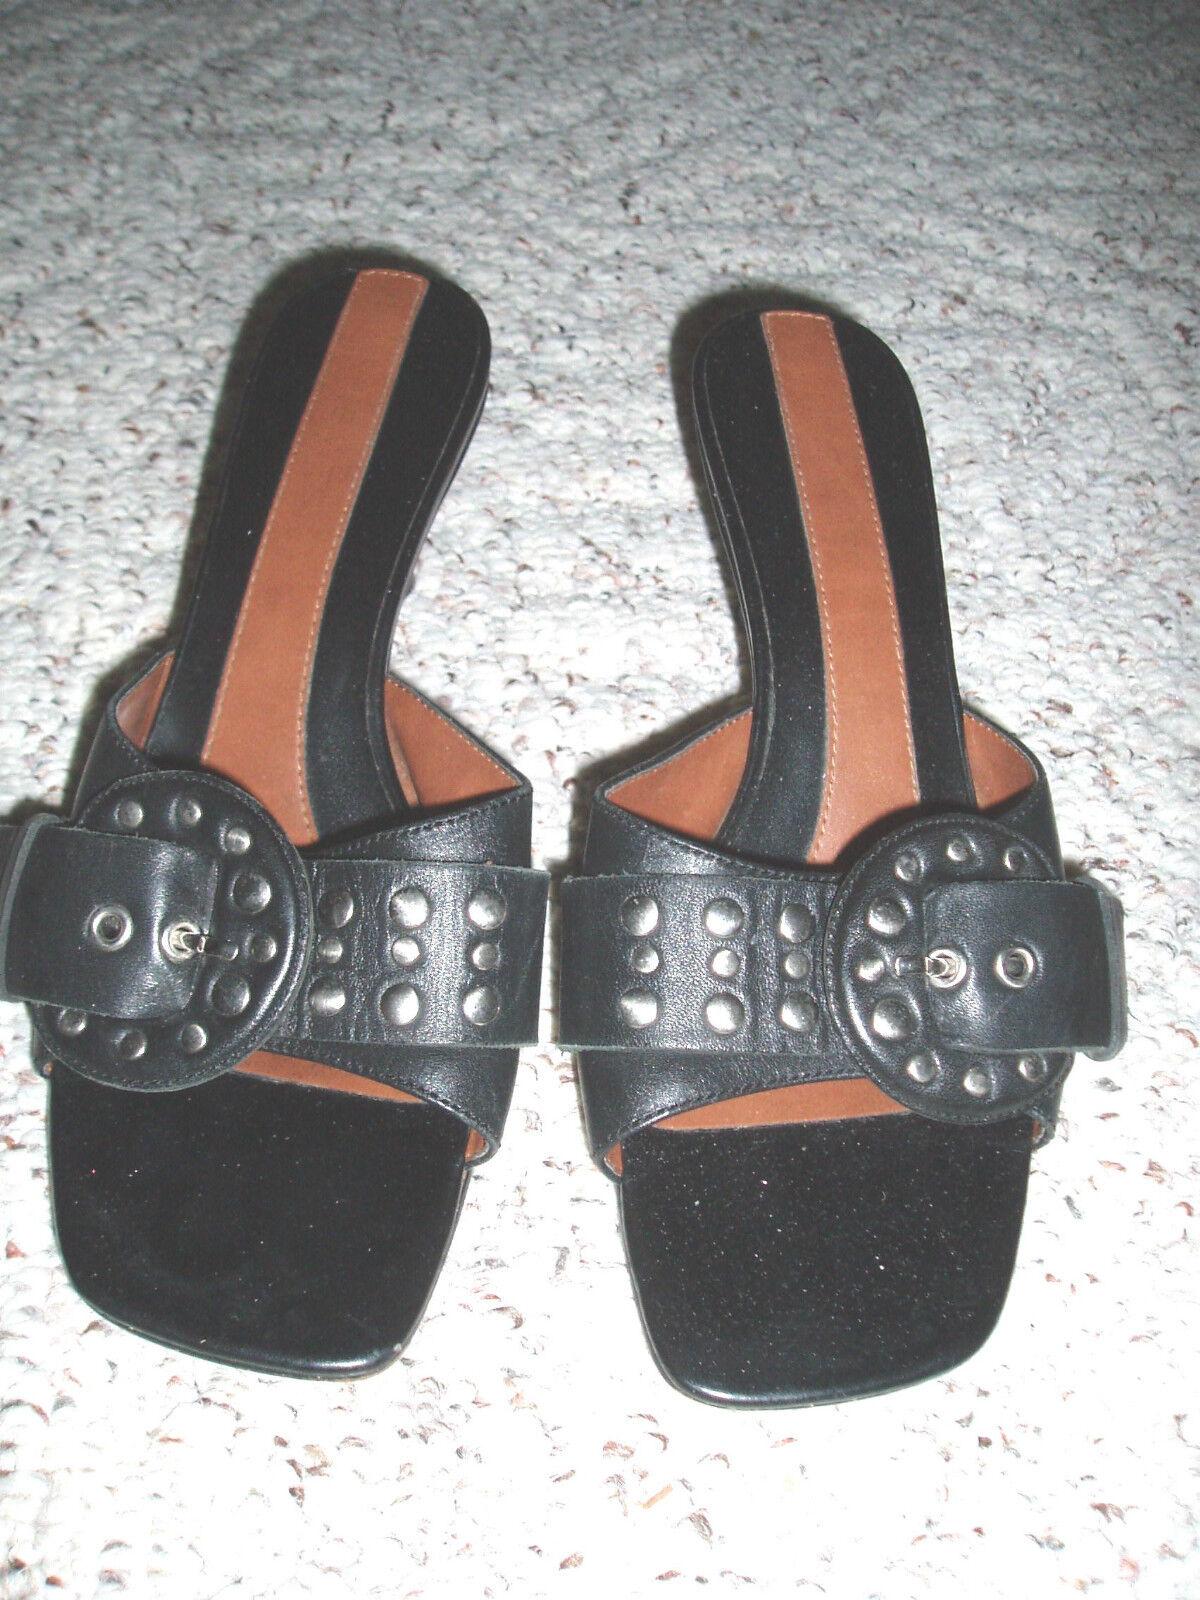 Leather Kitten NINE WEST Stud Buckle Kitten Leather Heel Slide Sandal Shoes~Black~6.5 6c941e